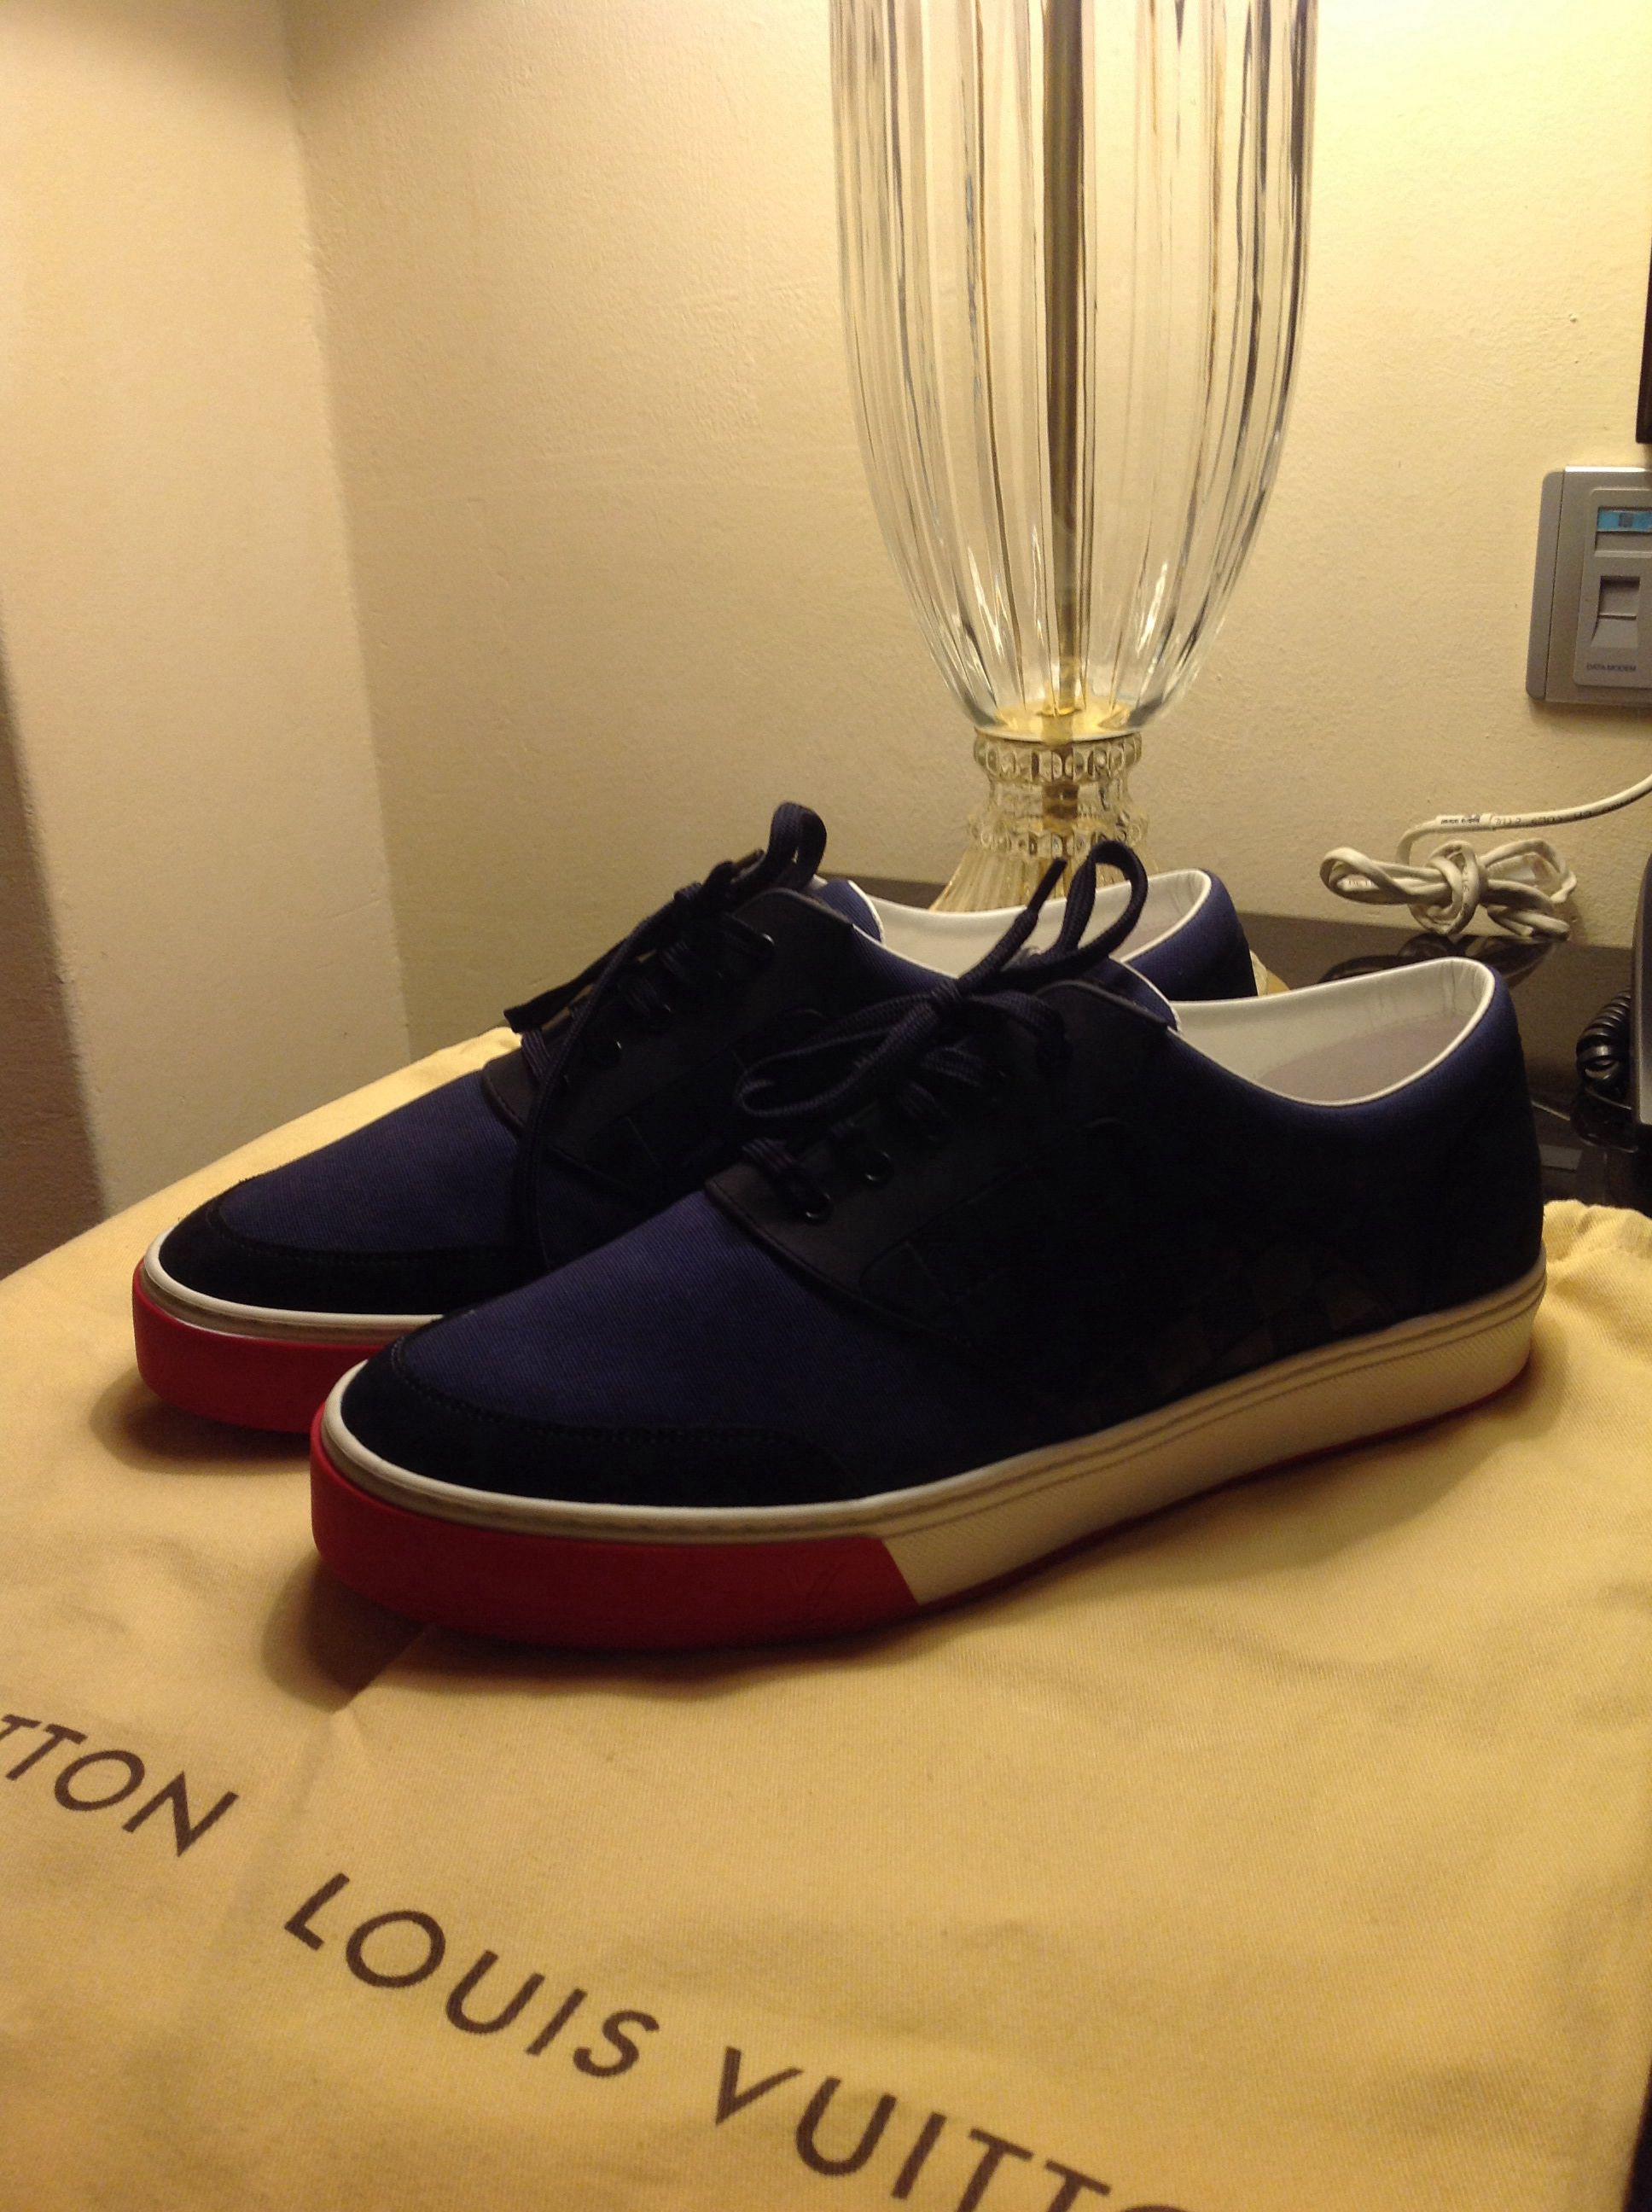 Louis Vuitton Men shoes Spring/summer 2014